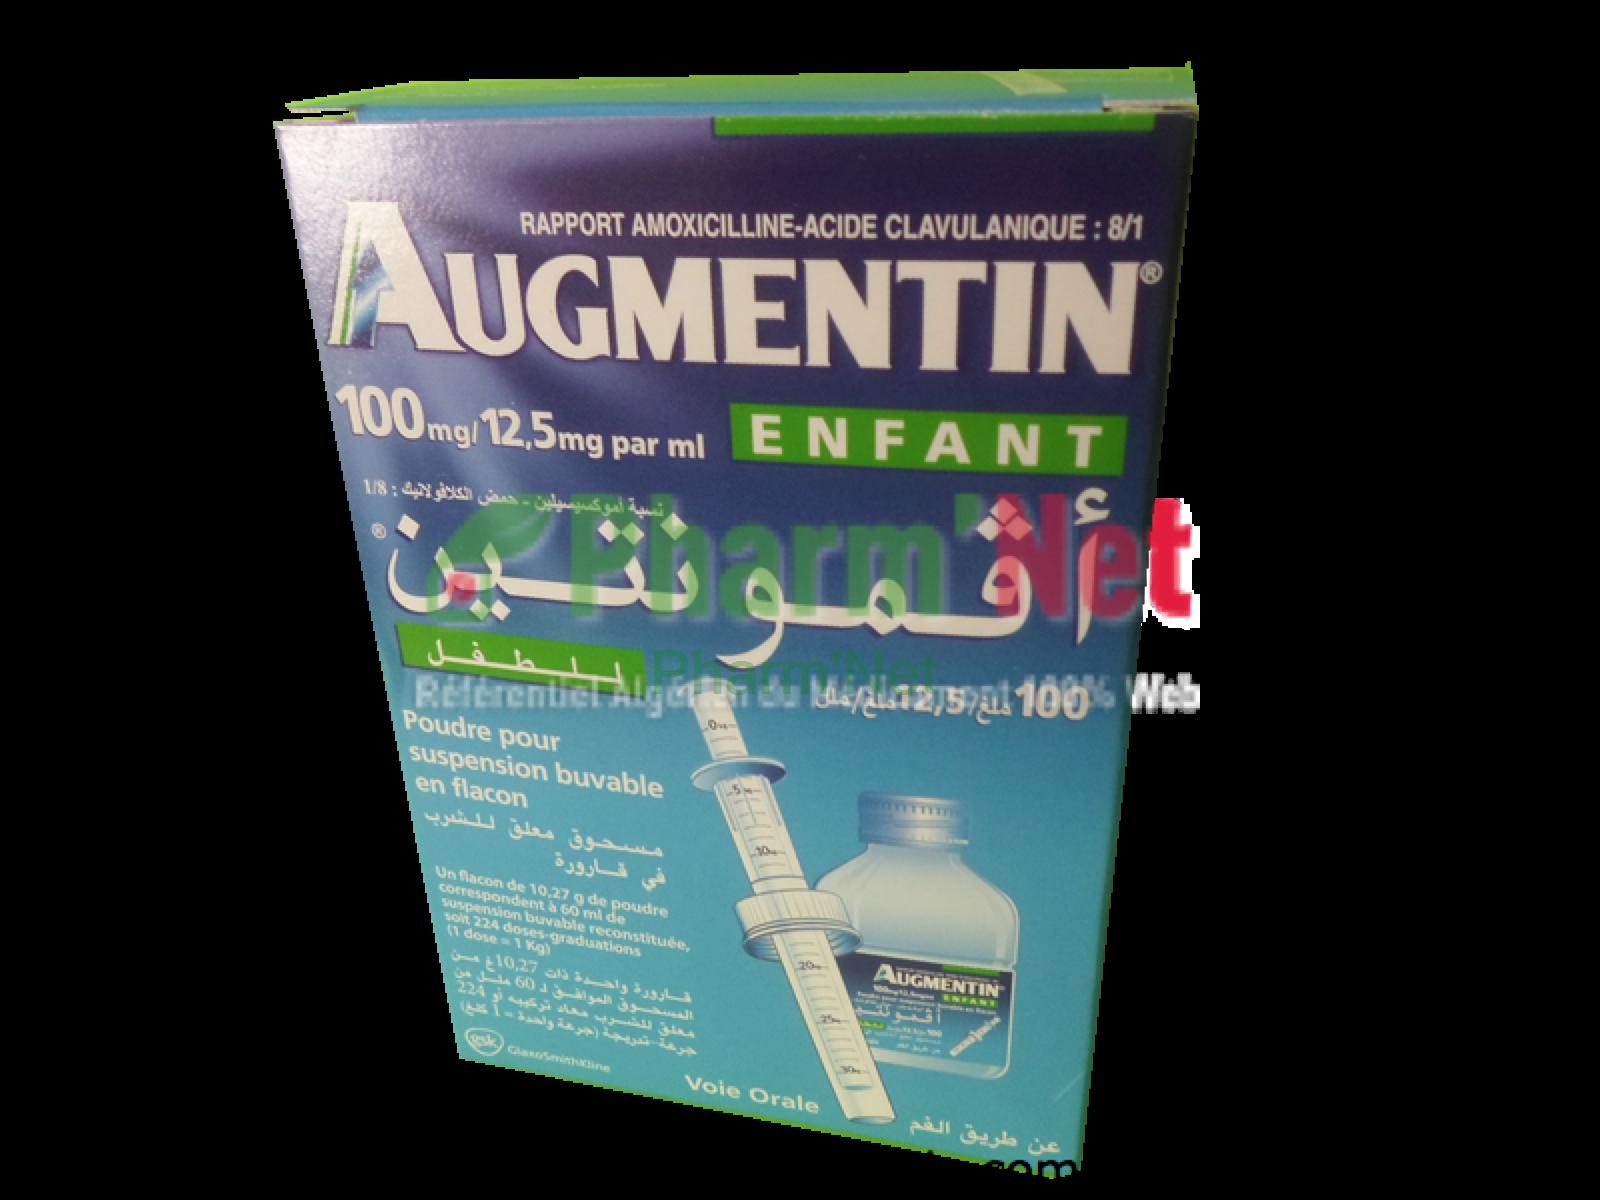 AUGMENTIN ENFANT ET AUGMENTIN NOURRISSON 100MG/12,5MG/ML